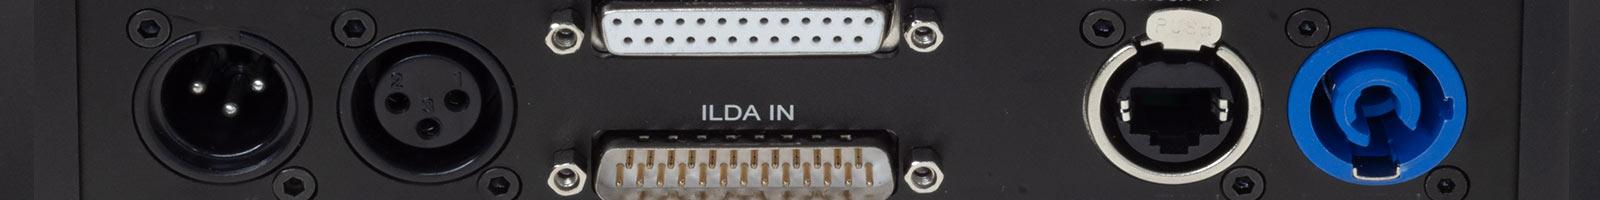 Manual ILDA Operation